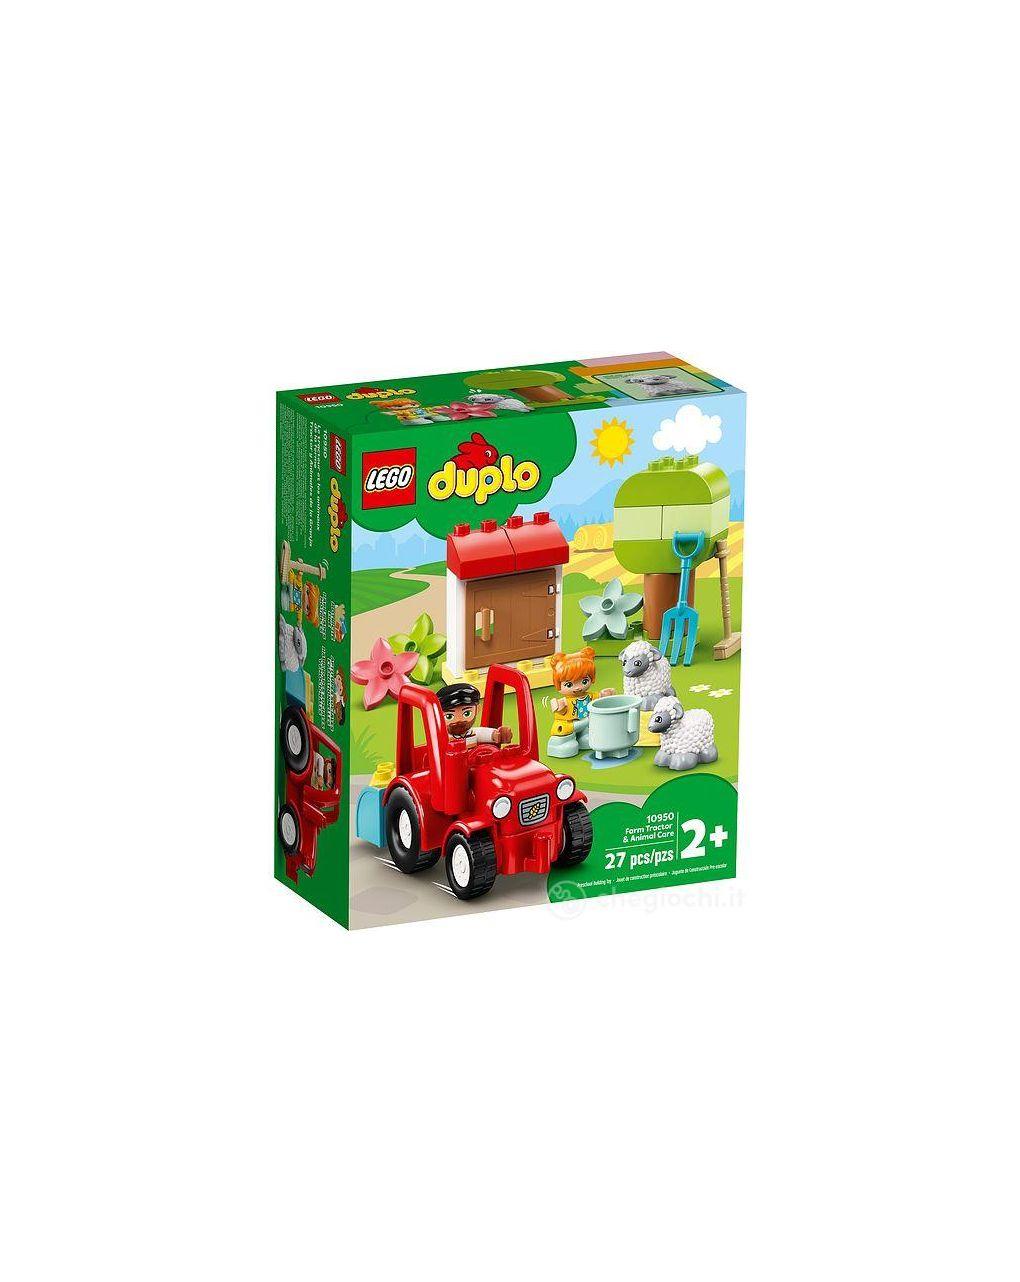 Lego duplo - o trator agrícola e seus animais - LEGO Duplo